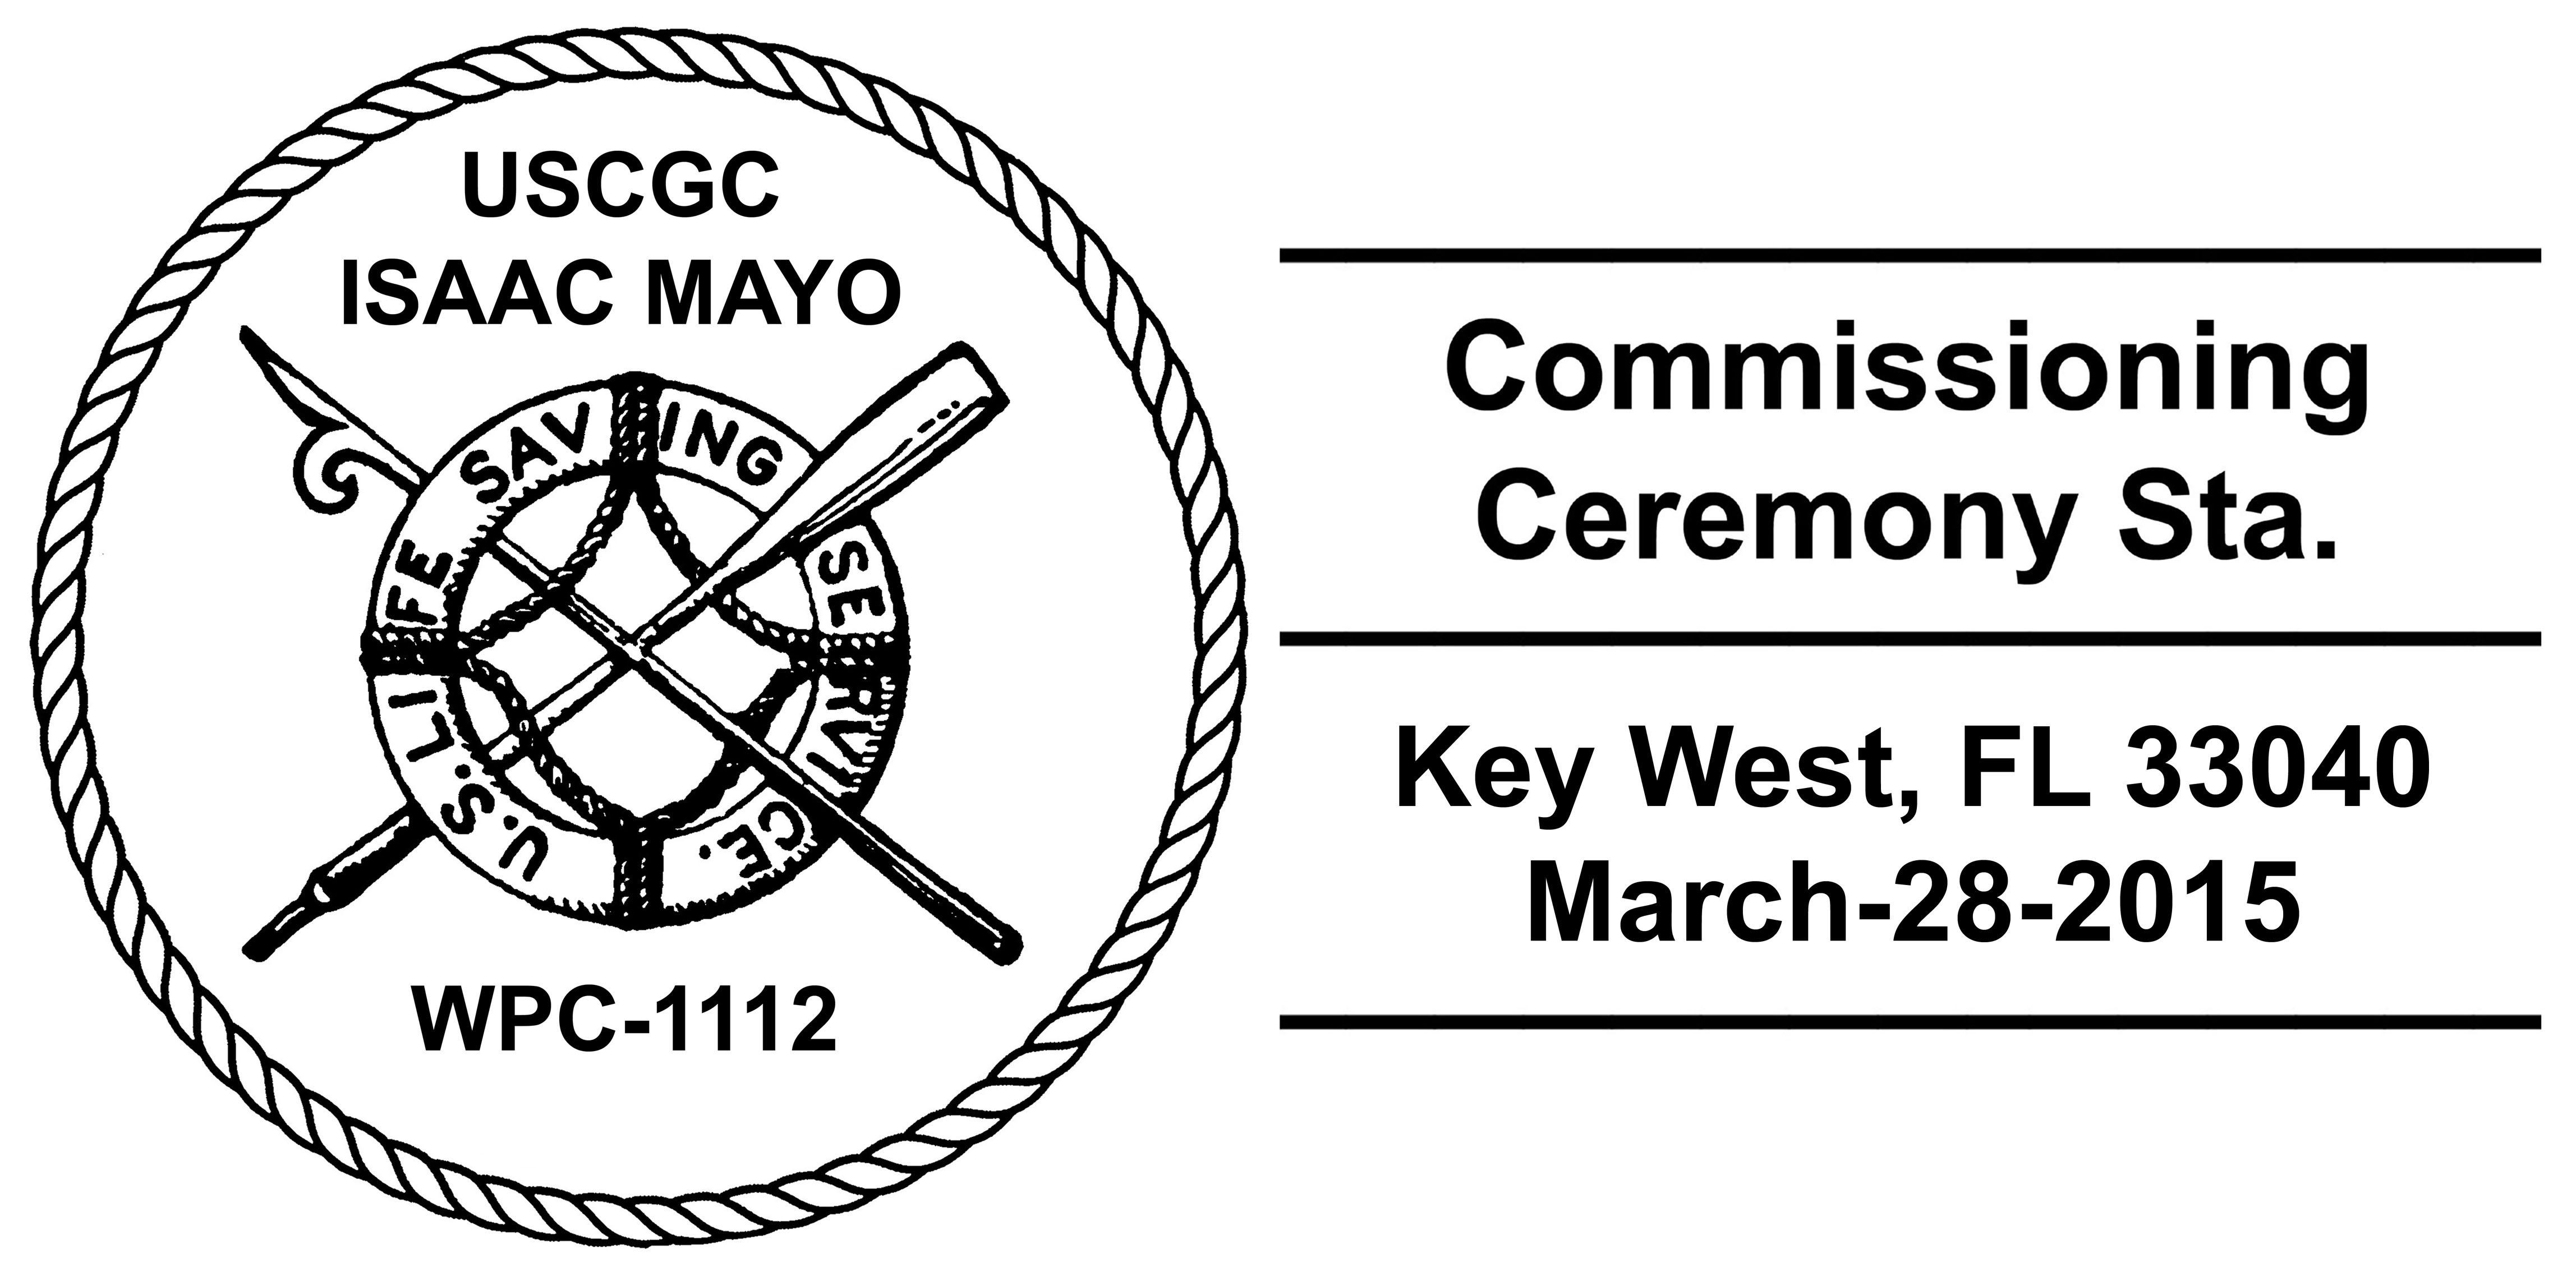 Sonderpoststempel USCGC ISAAC MAYO WPC-1112 Indienststellung Grafik: Wolfgang Hechler